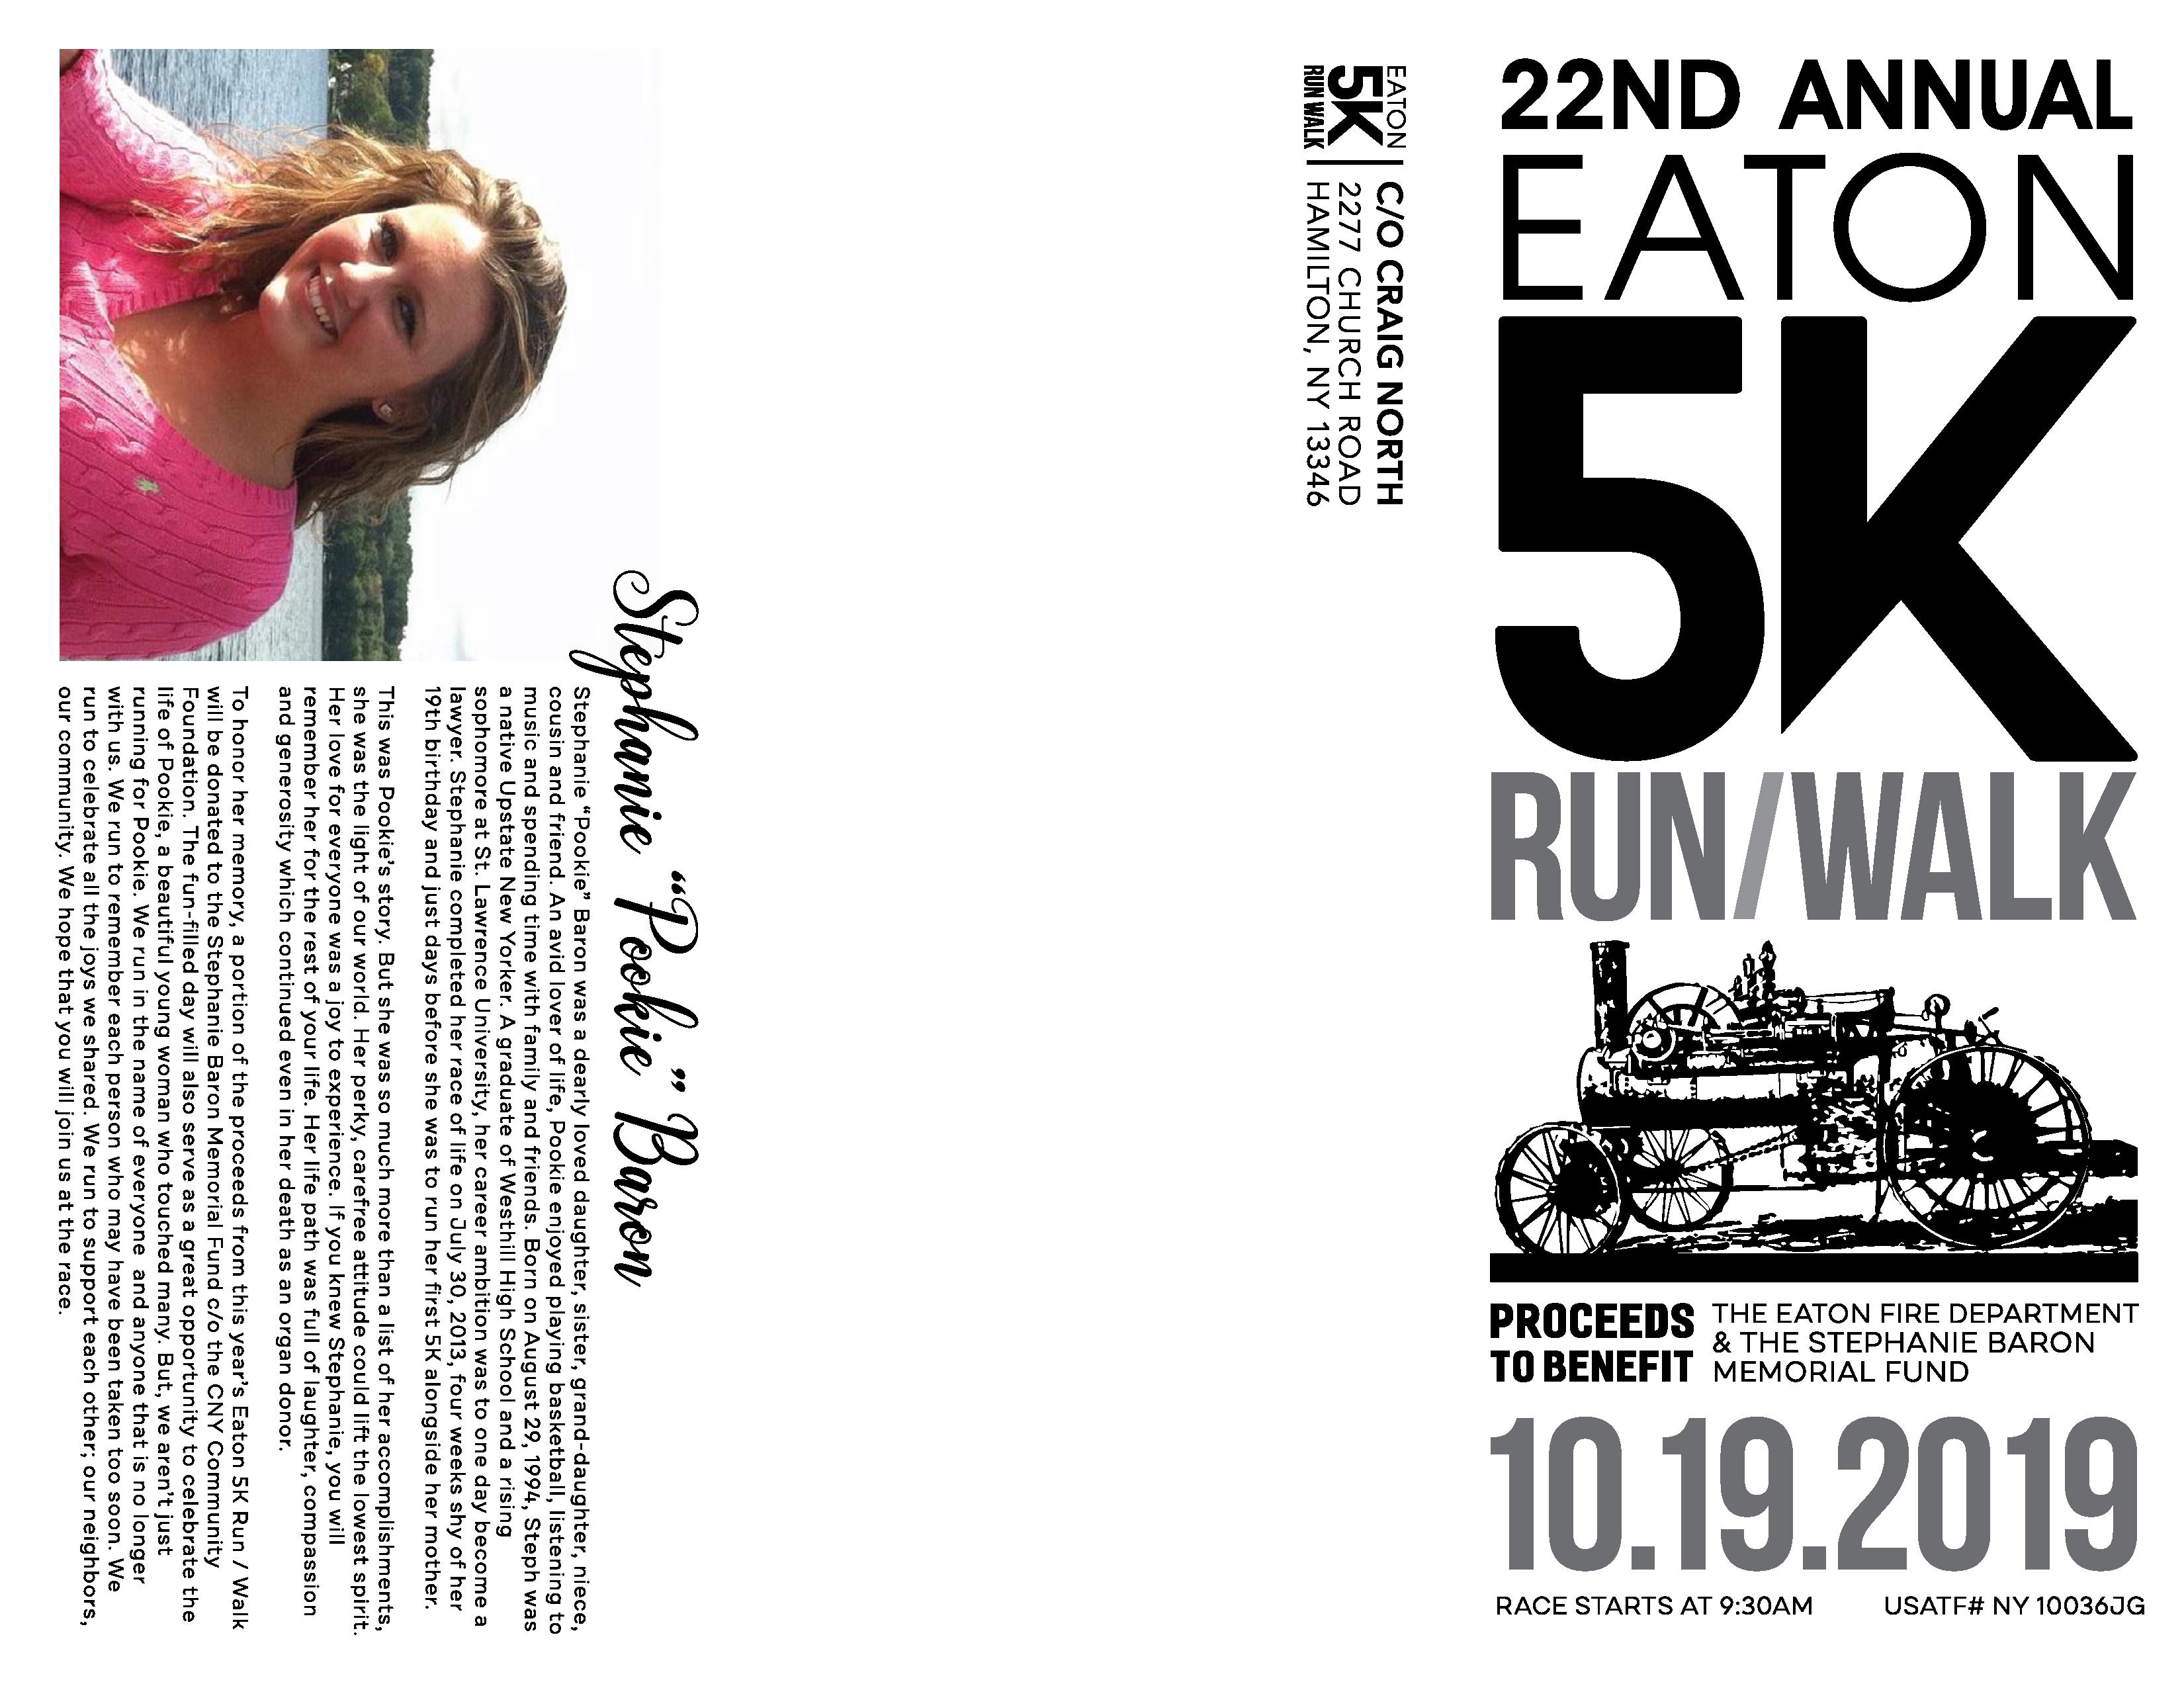 22nd Annual Eaton 5K Run/Walk